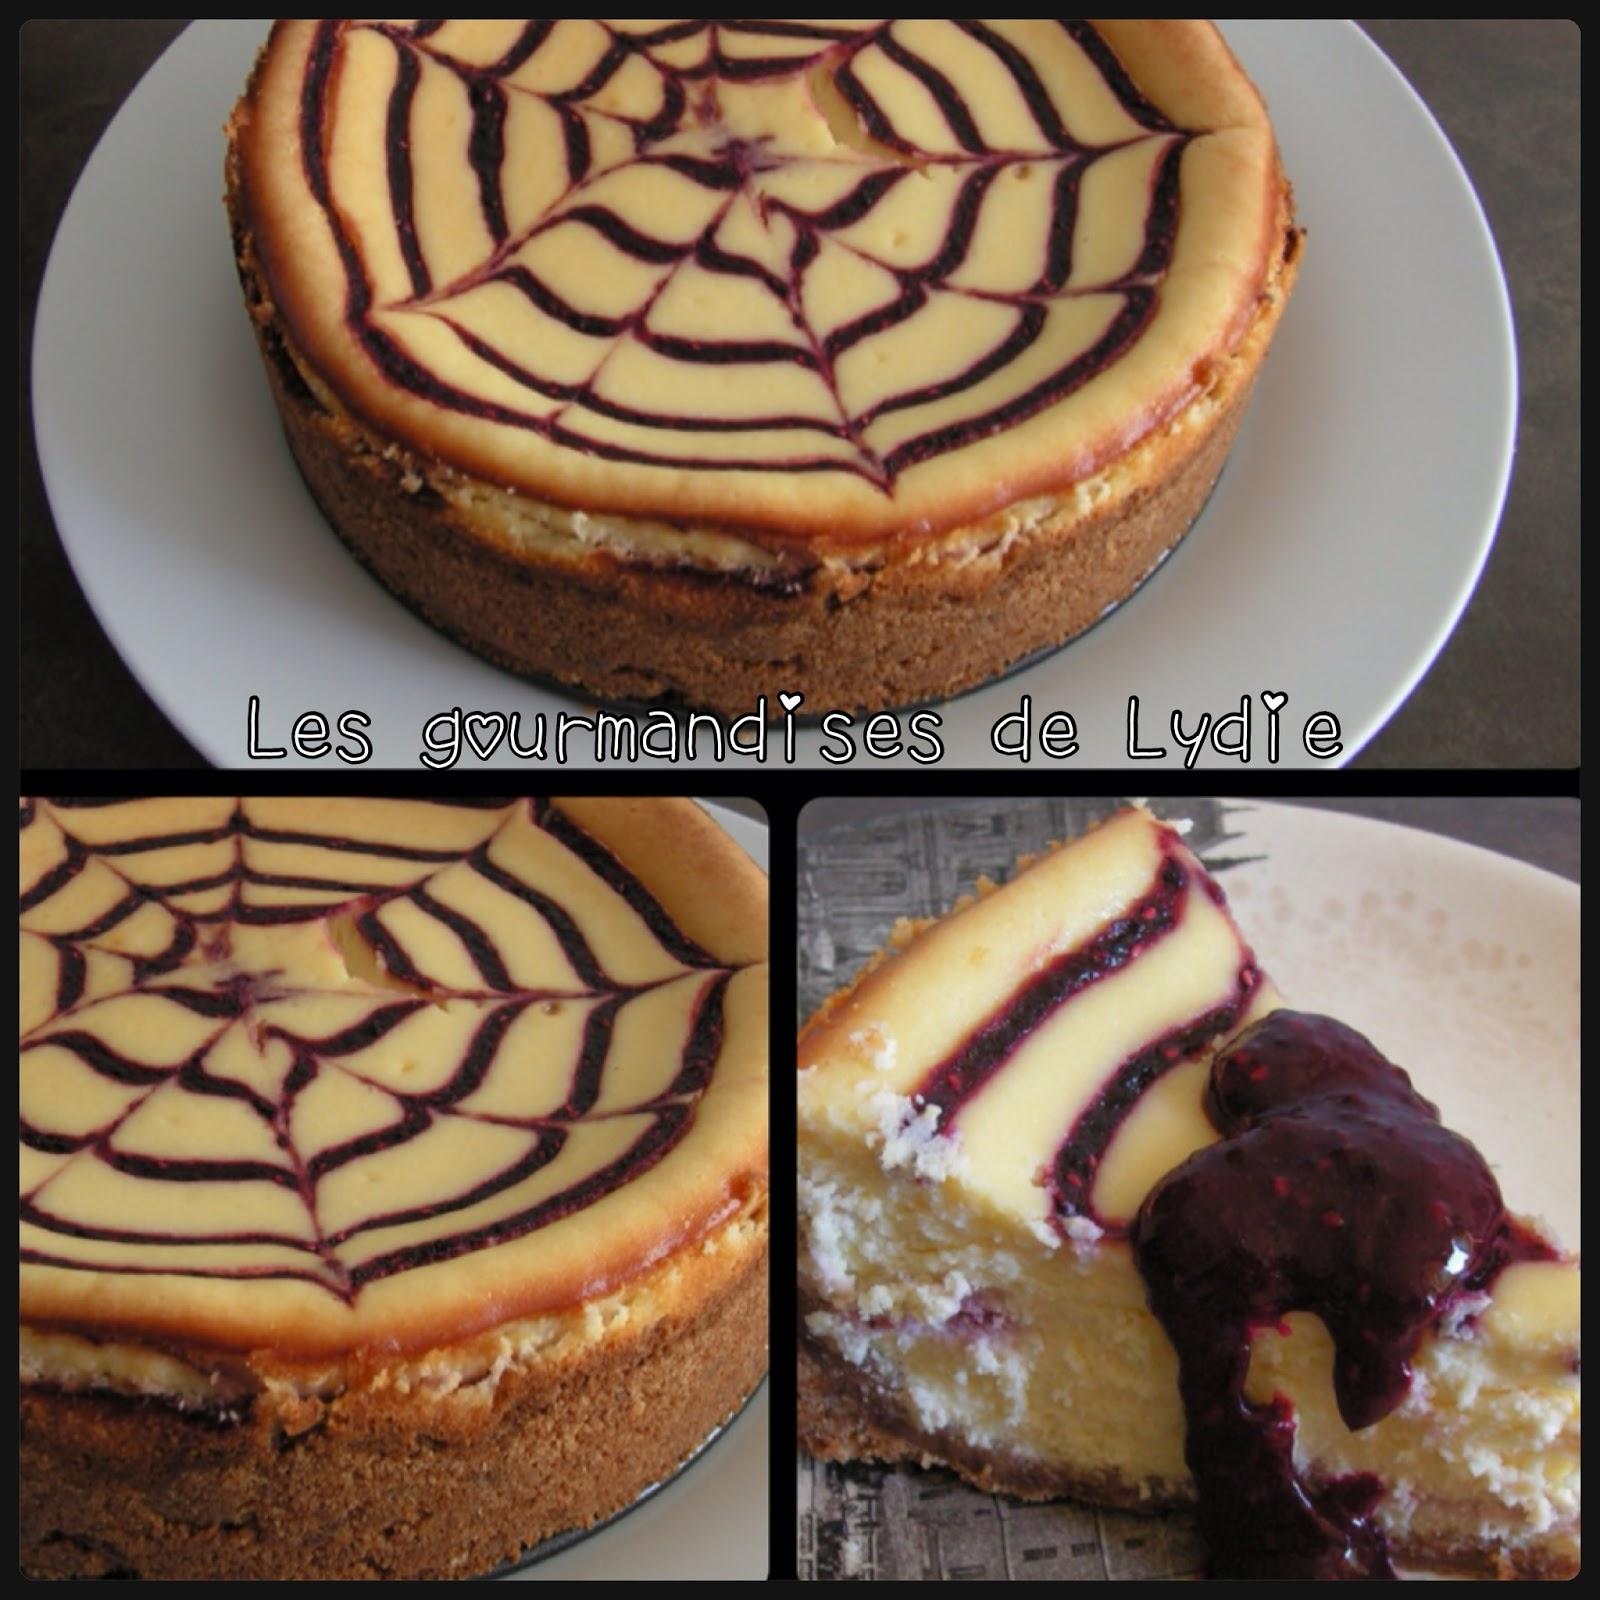 les gourmandises de lydie cheesecake chocolat blanc aux. Black Bedroom Furniture Sets. Home Design Ideas